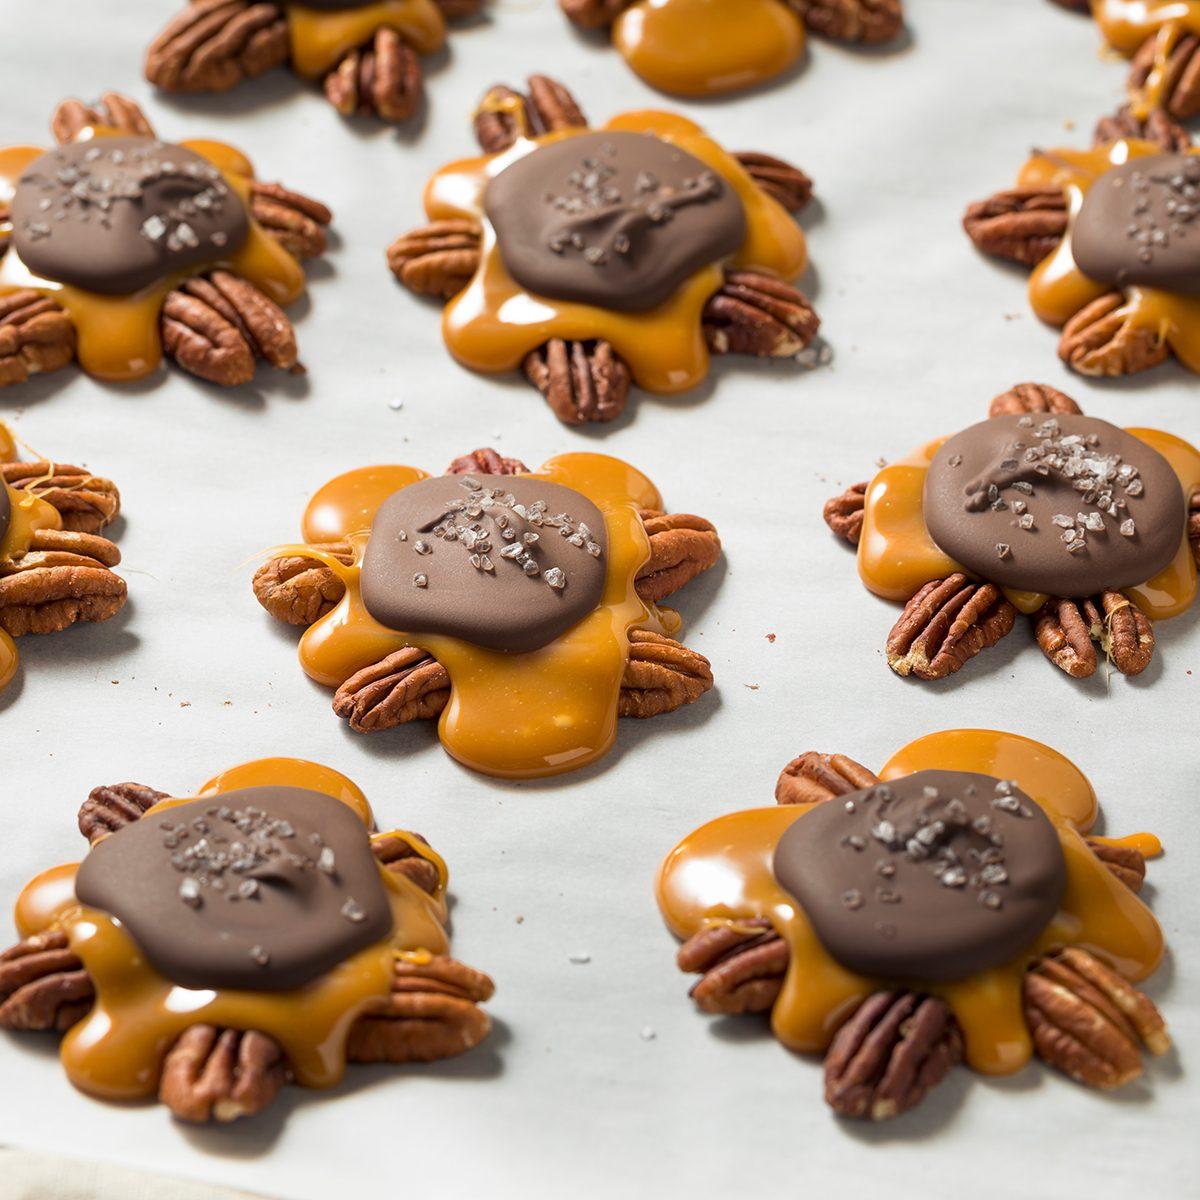 Homemade Sweet Chocolate Caramel Turtles with Pecans